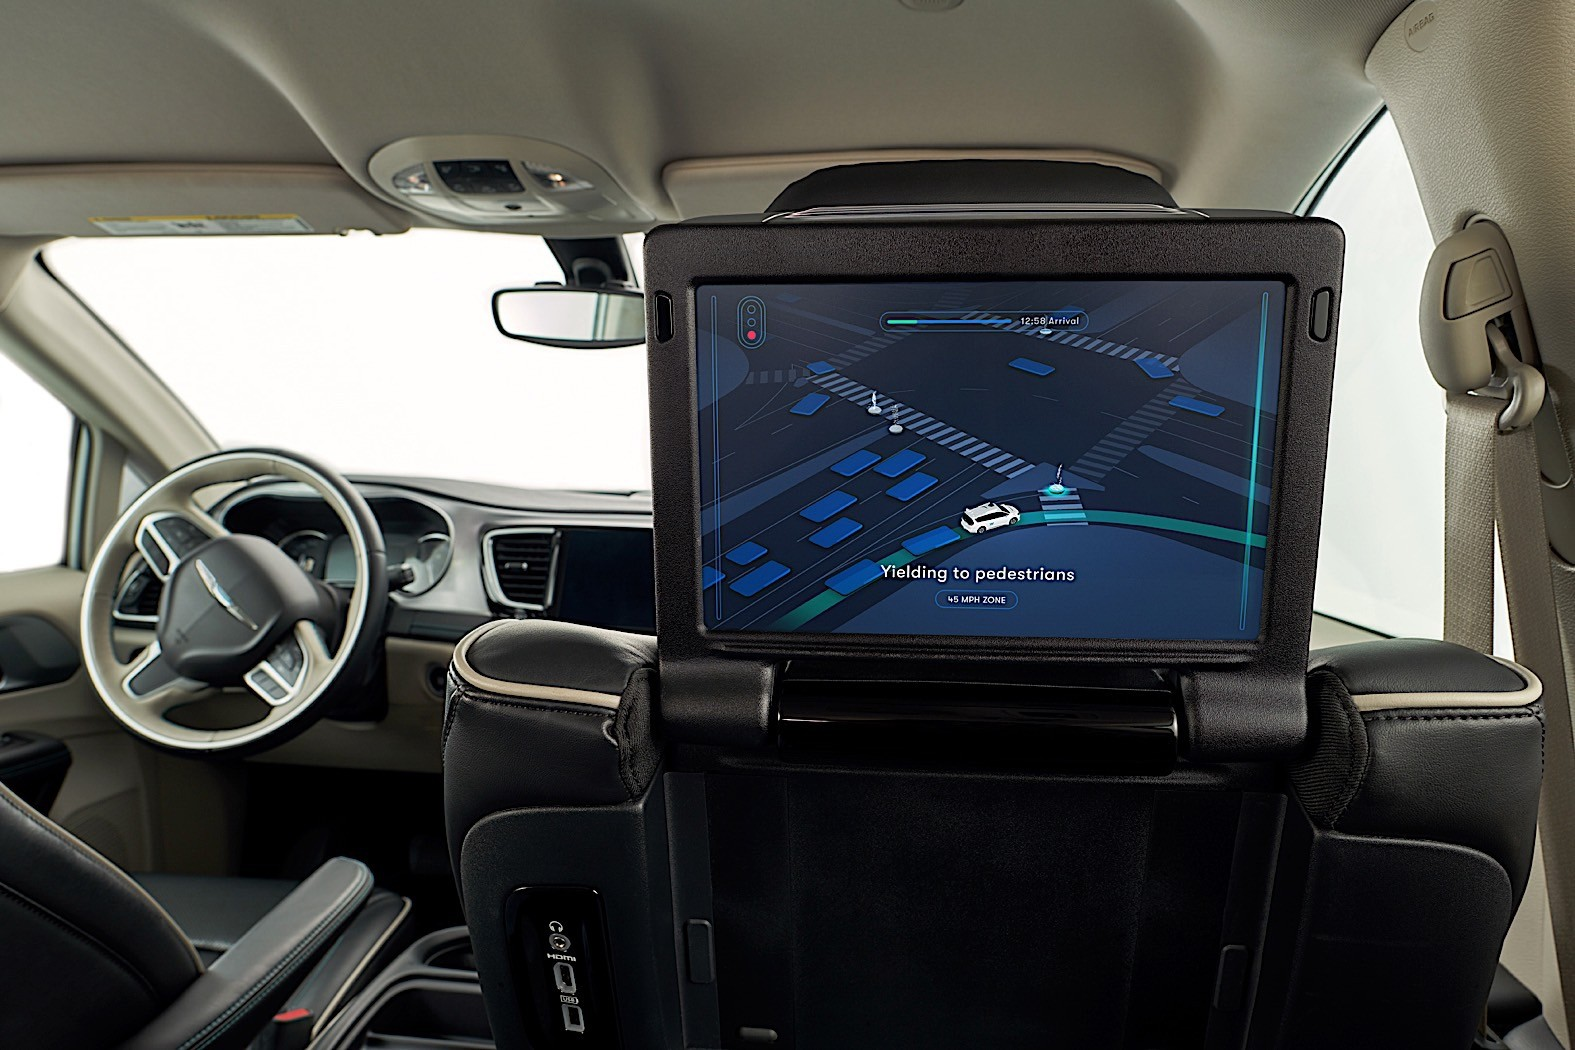 Driverless Car Waymo Ordered Thousands of MiniVans from Fiat Chrysler